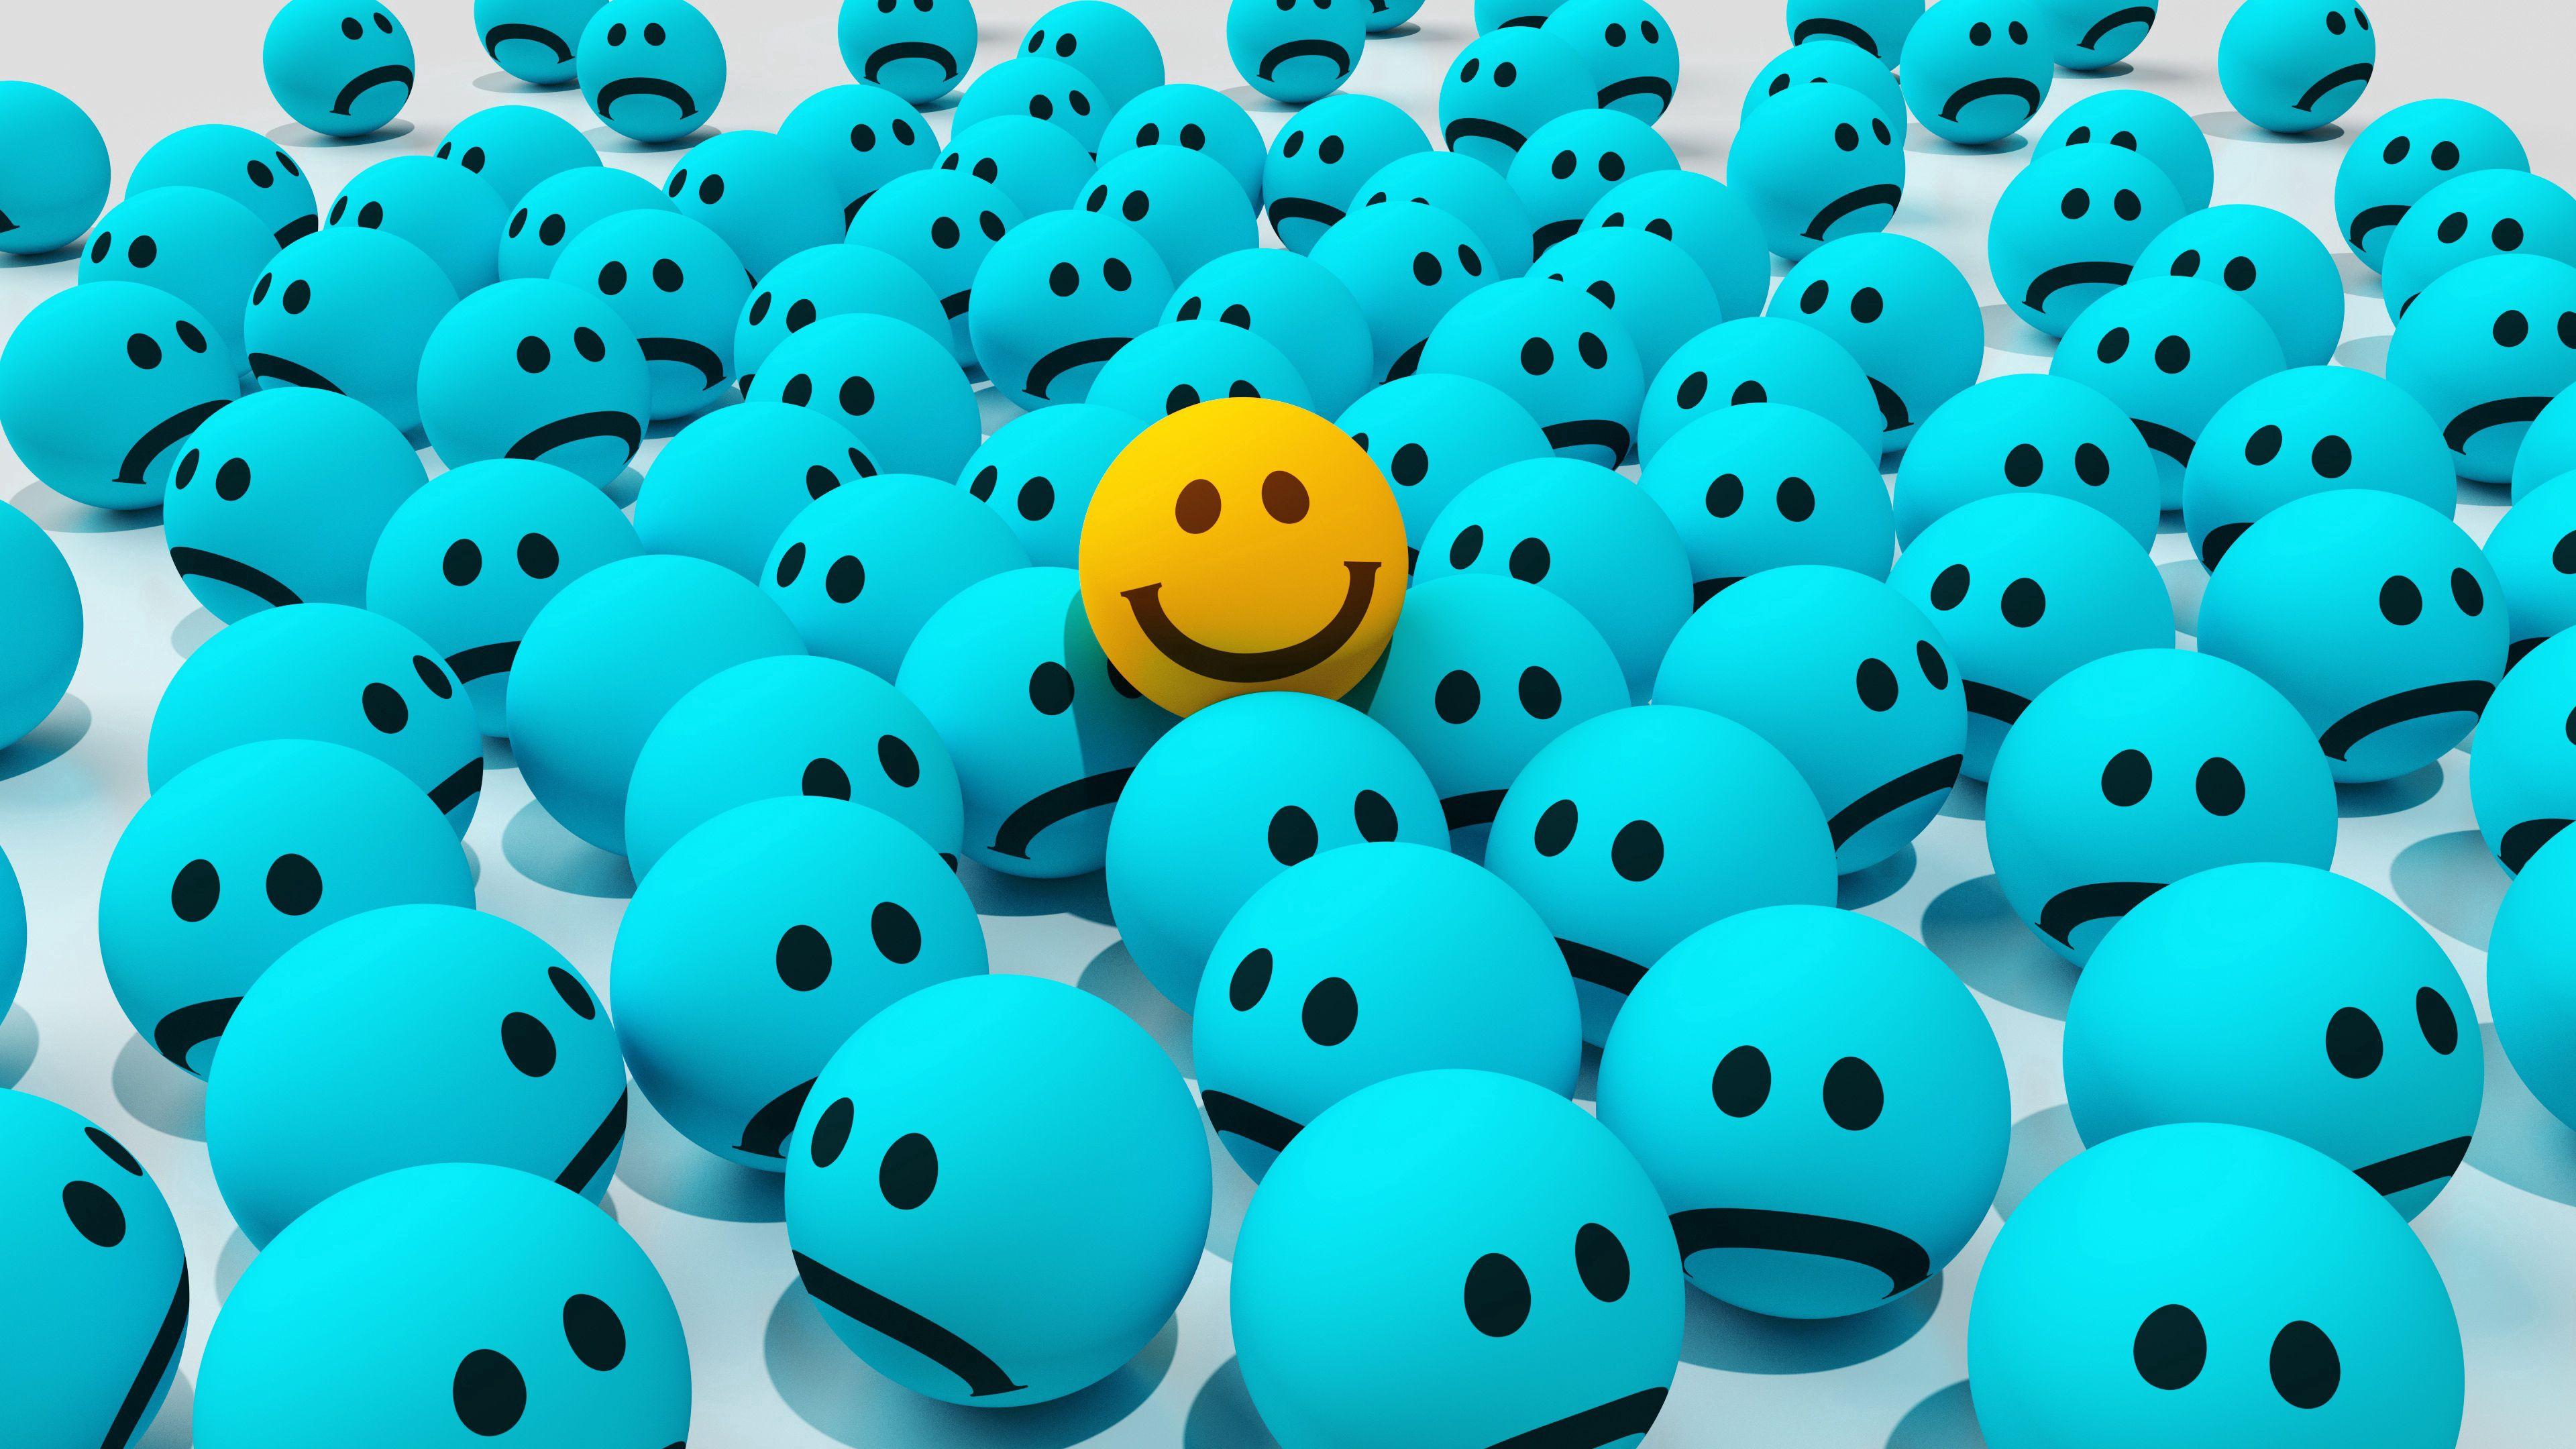 3840x2160 Wallpaper smiles, joy, sadness